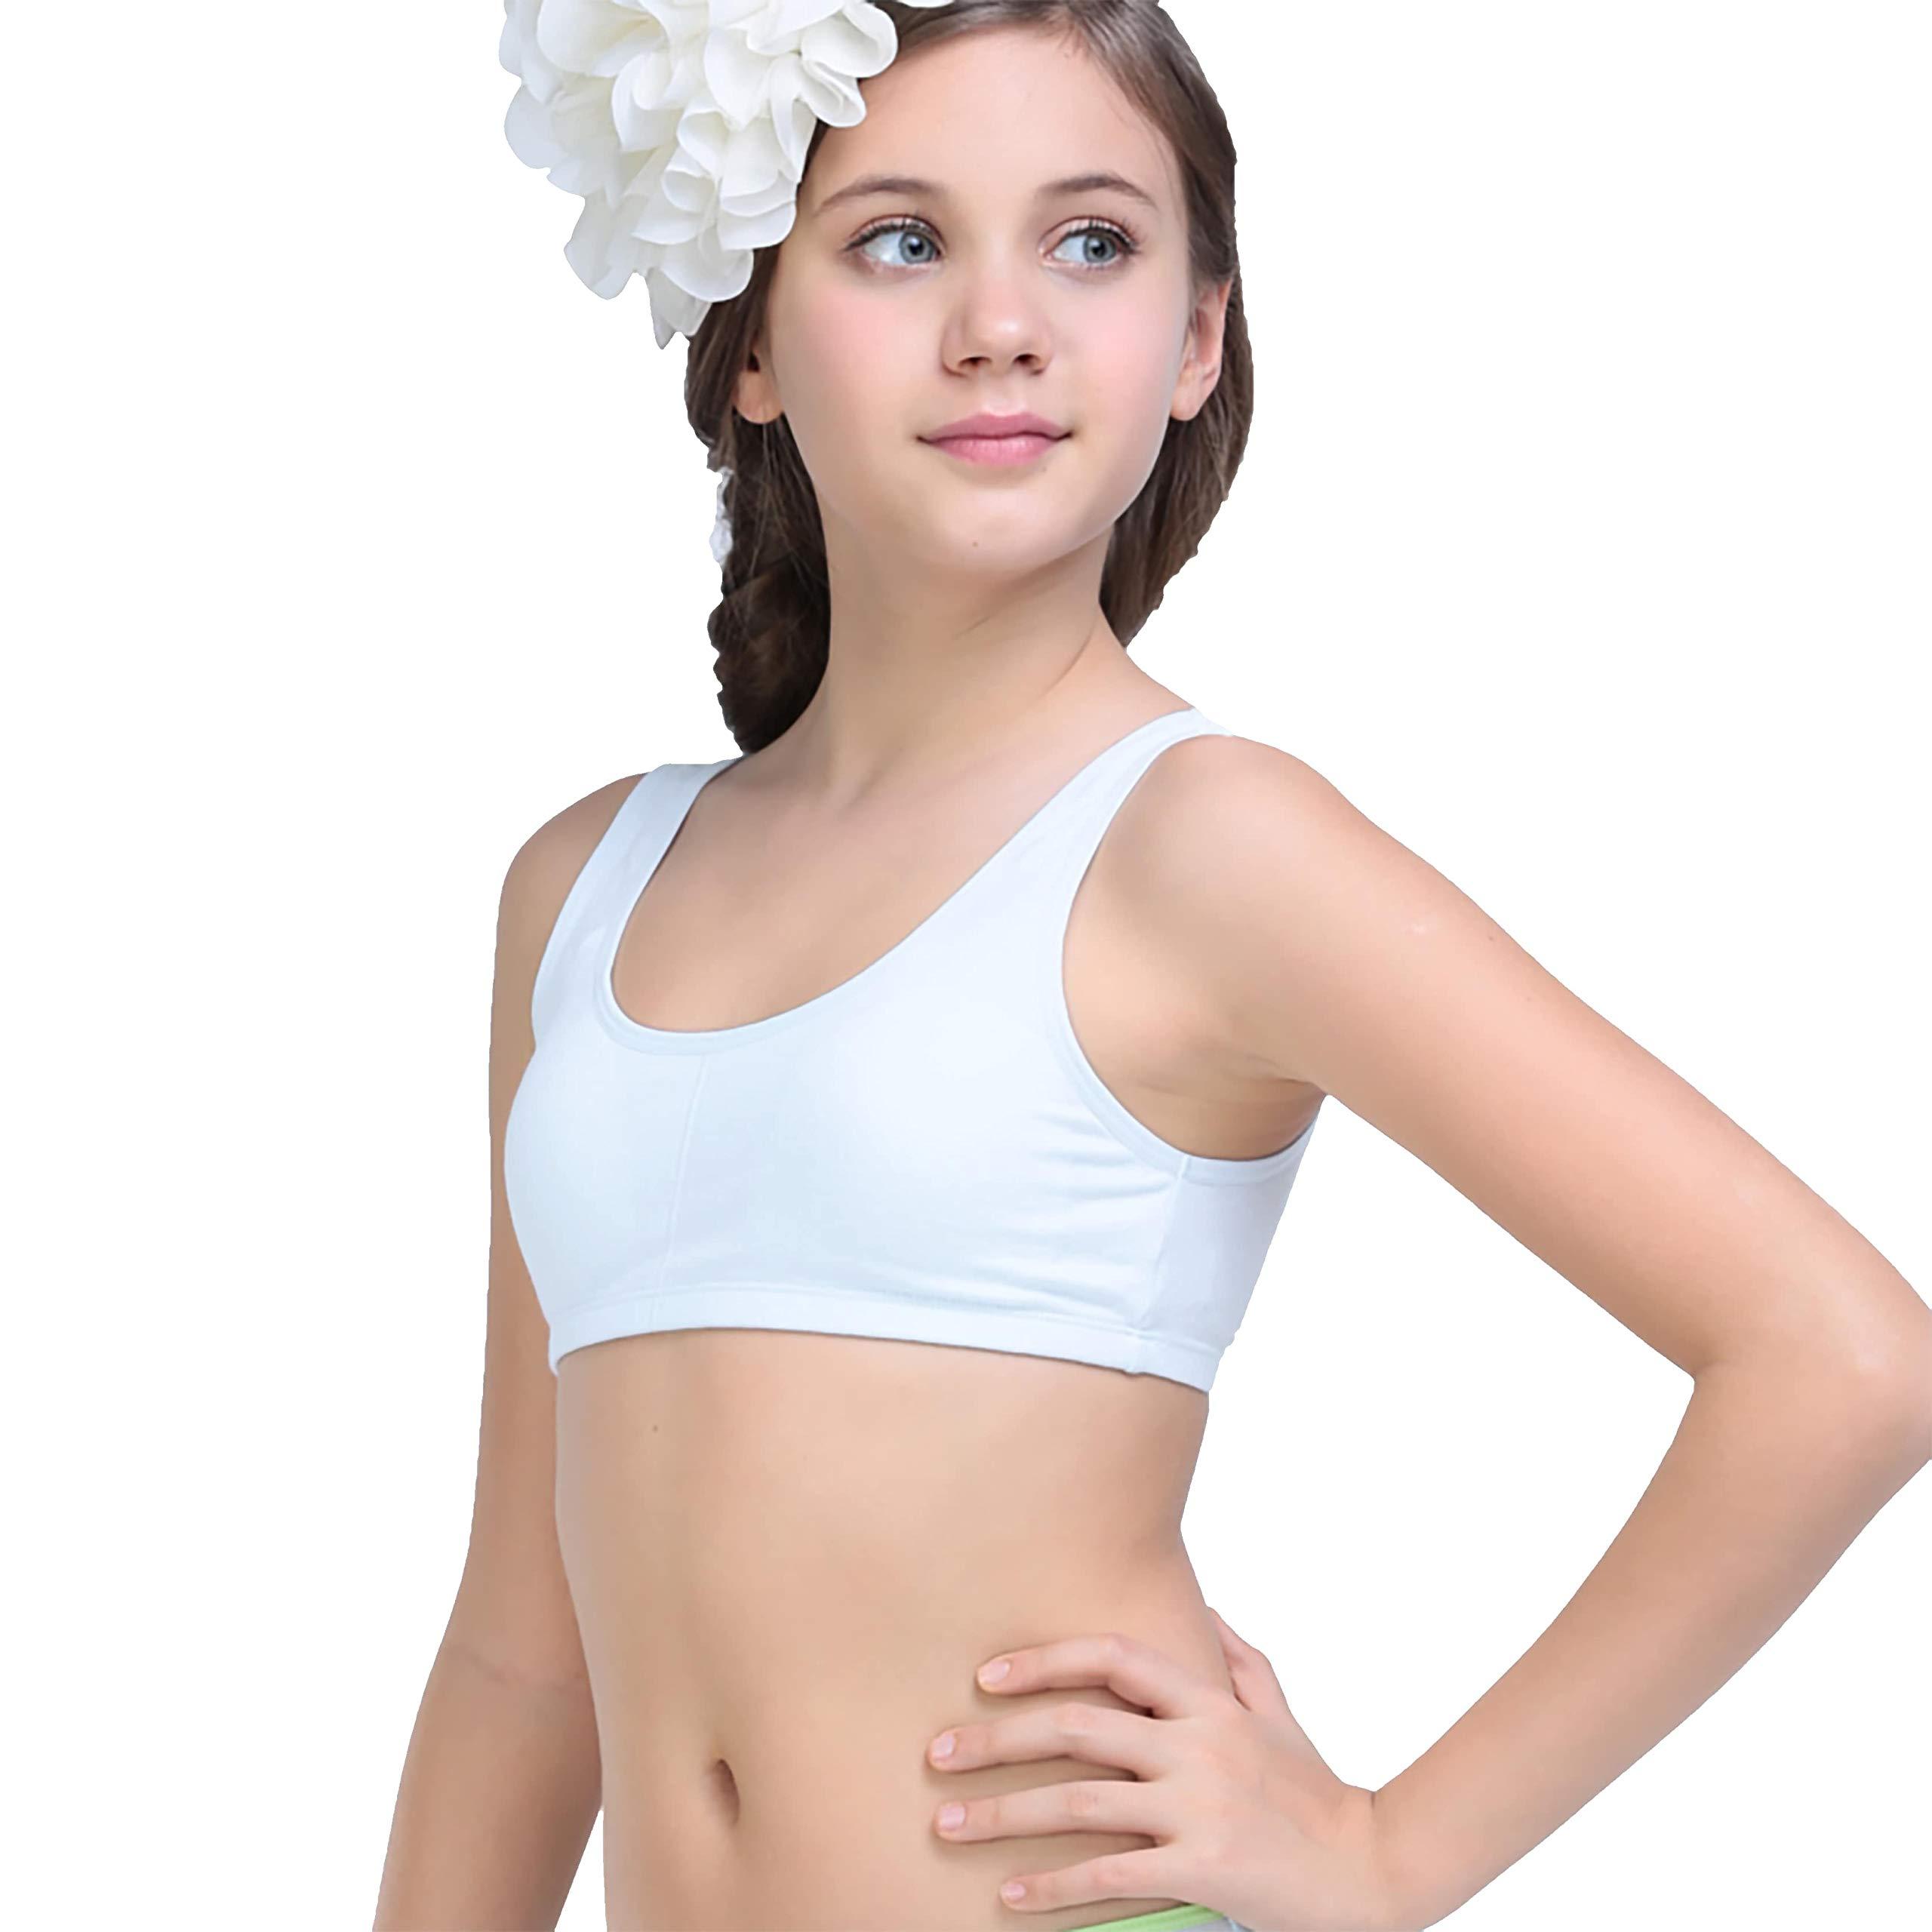 ADMIRE Girls Cotton Sport TOP PACKOF2 (13-14 Years, White) (B07QDJTRJY) Amazon Price History, Amazon Price Tracker